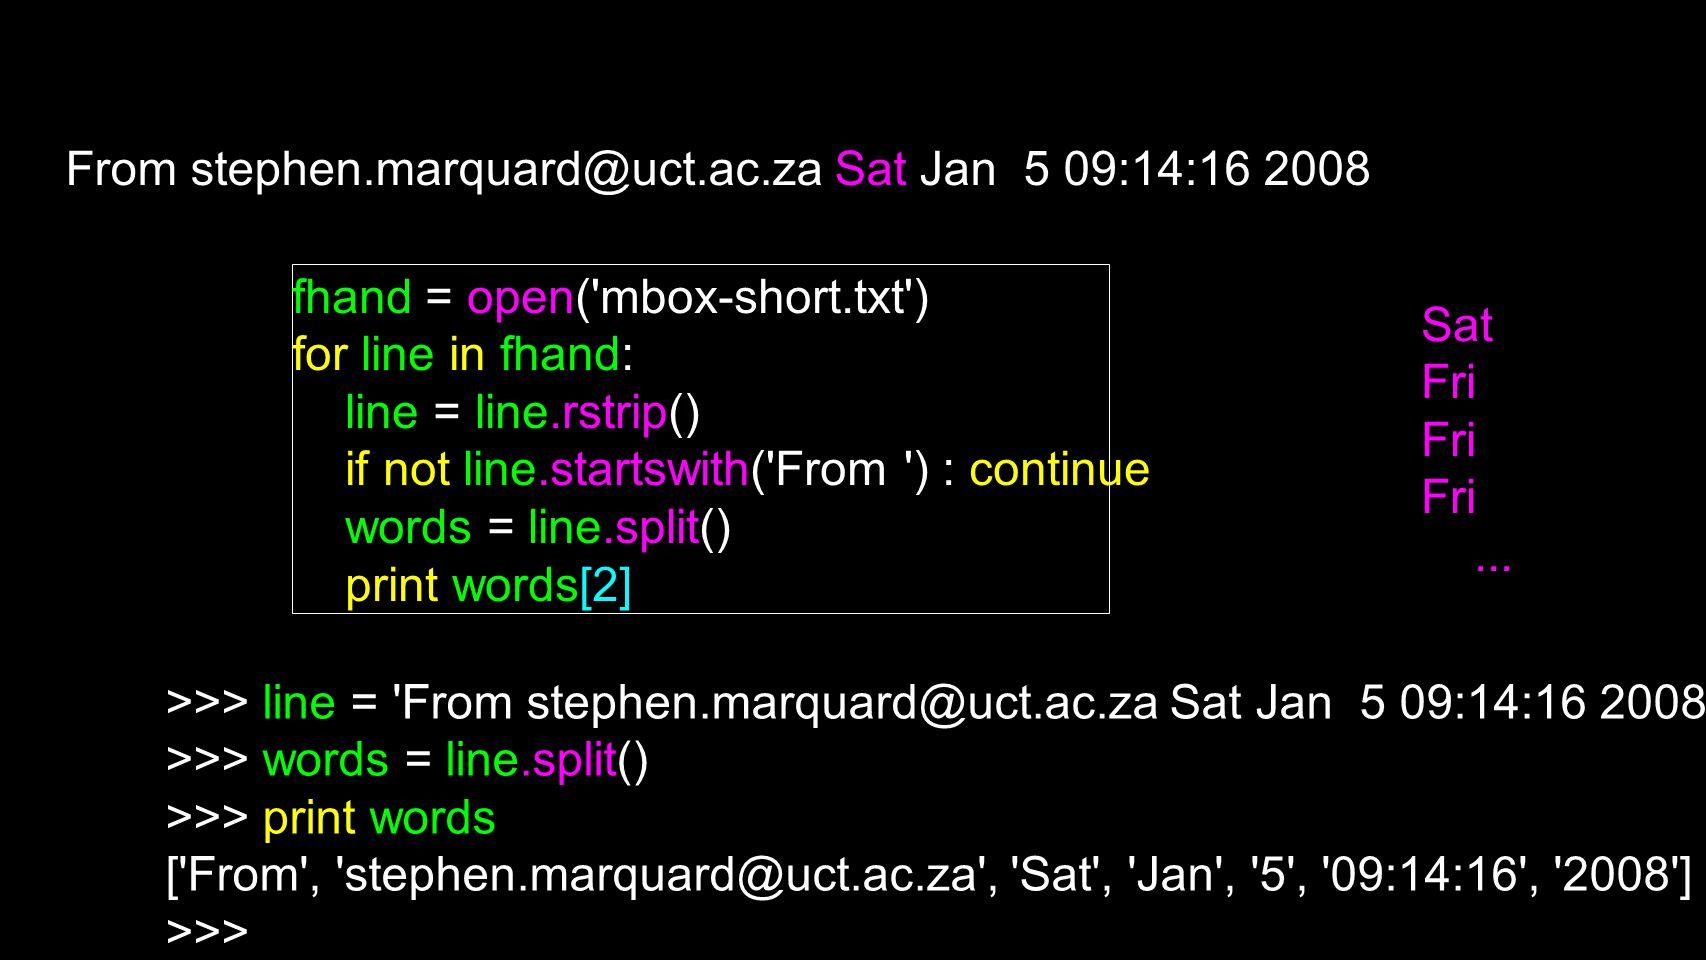 From stephen.marquard@uct.ac.za Sat Jan 5 09:14:16 2008